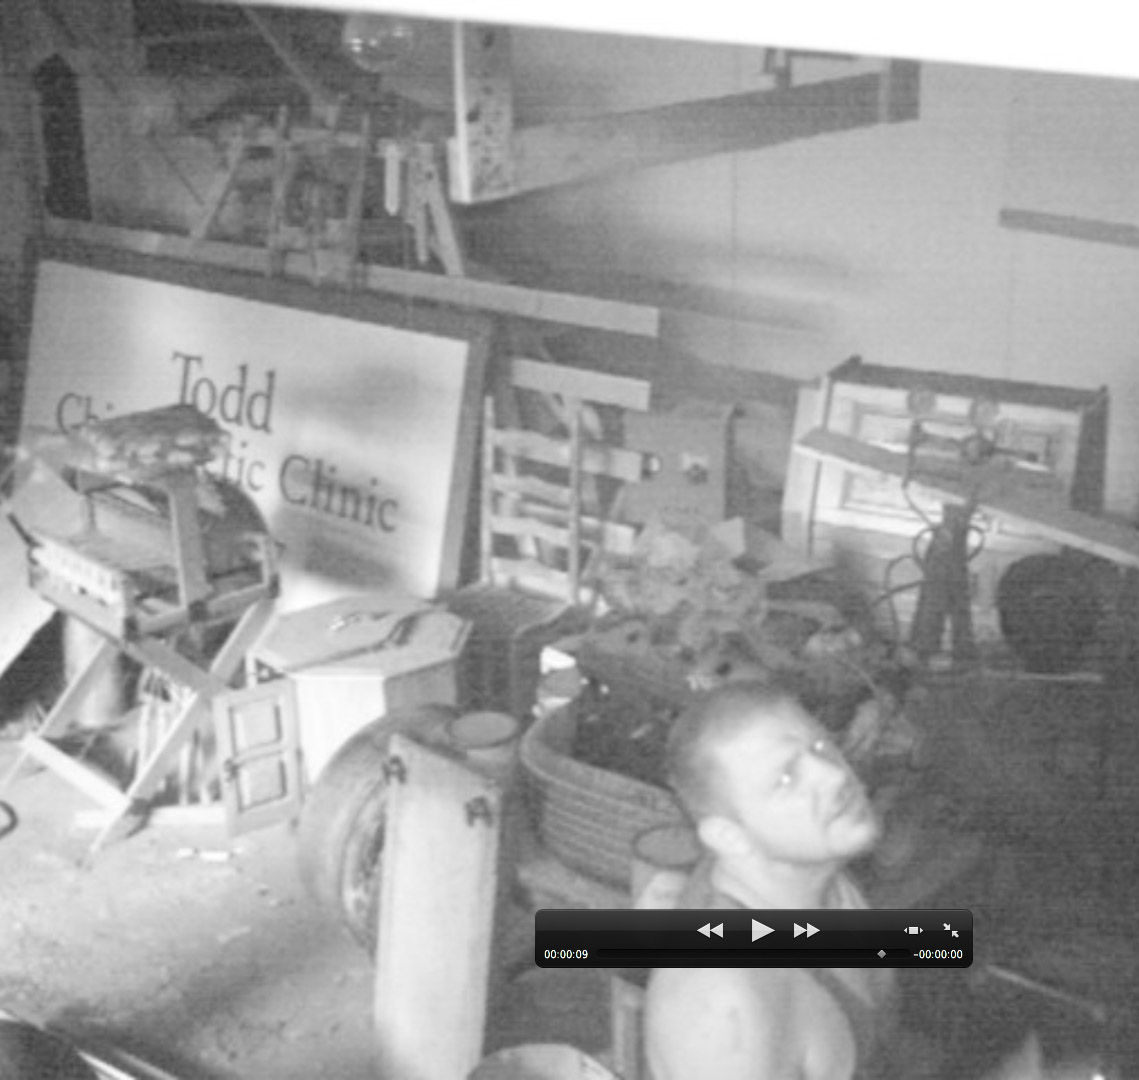 7-14 Copper wire burglary 2.jpg